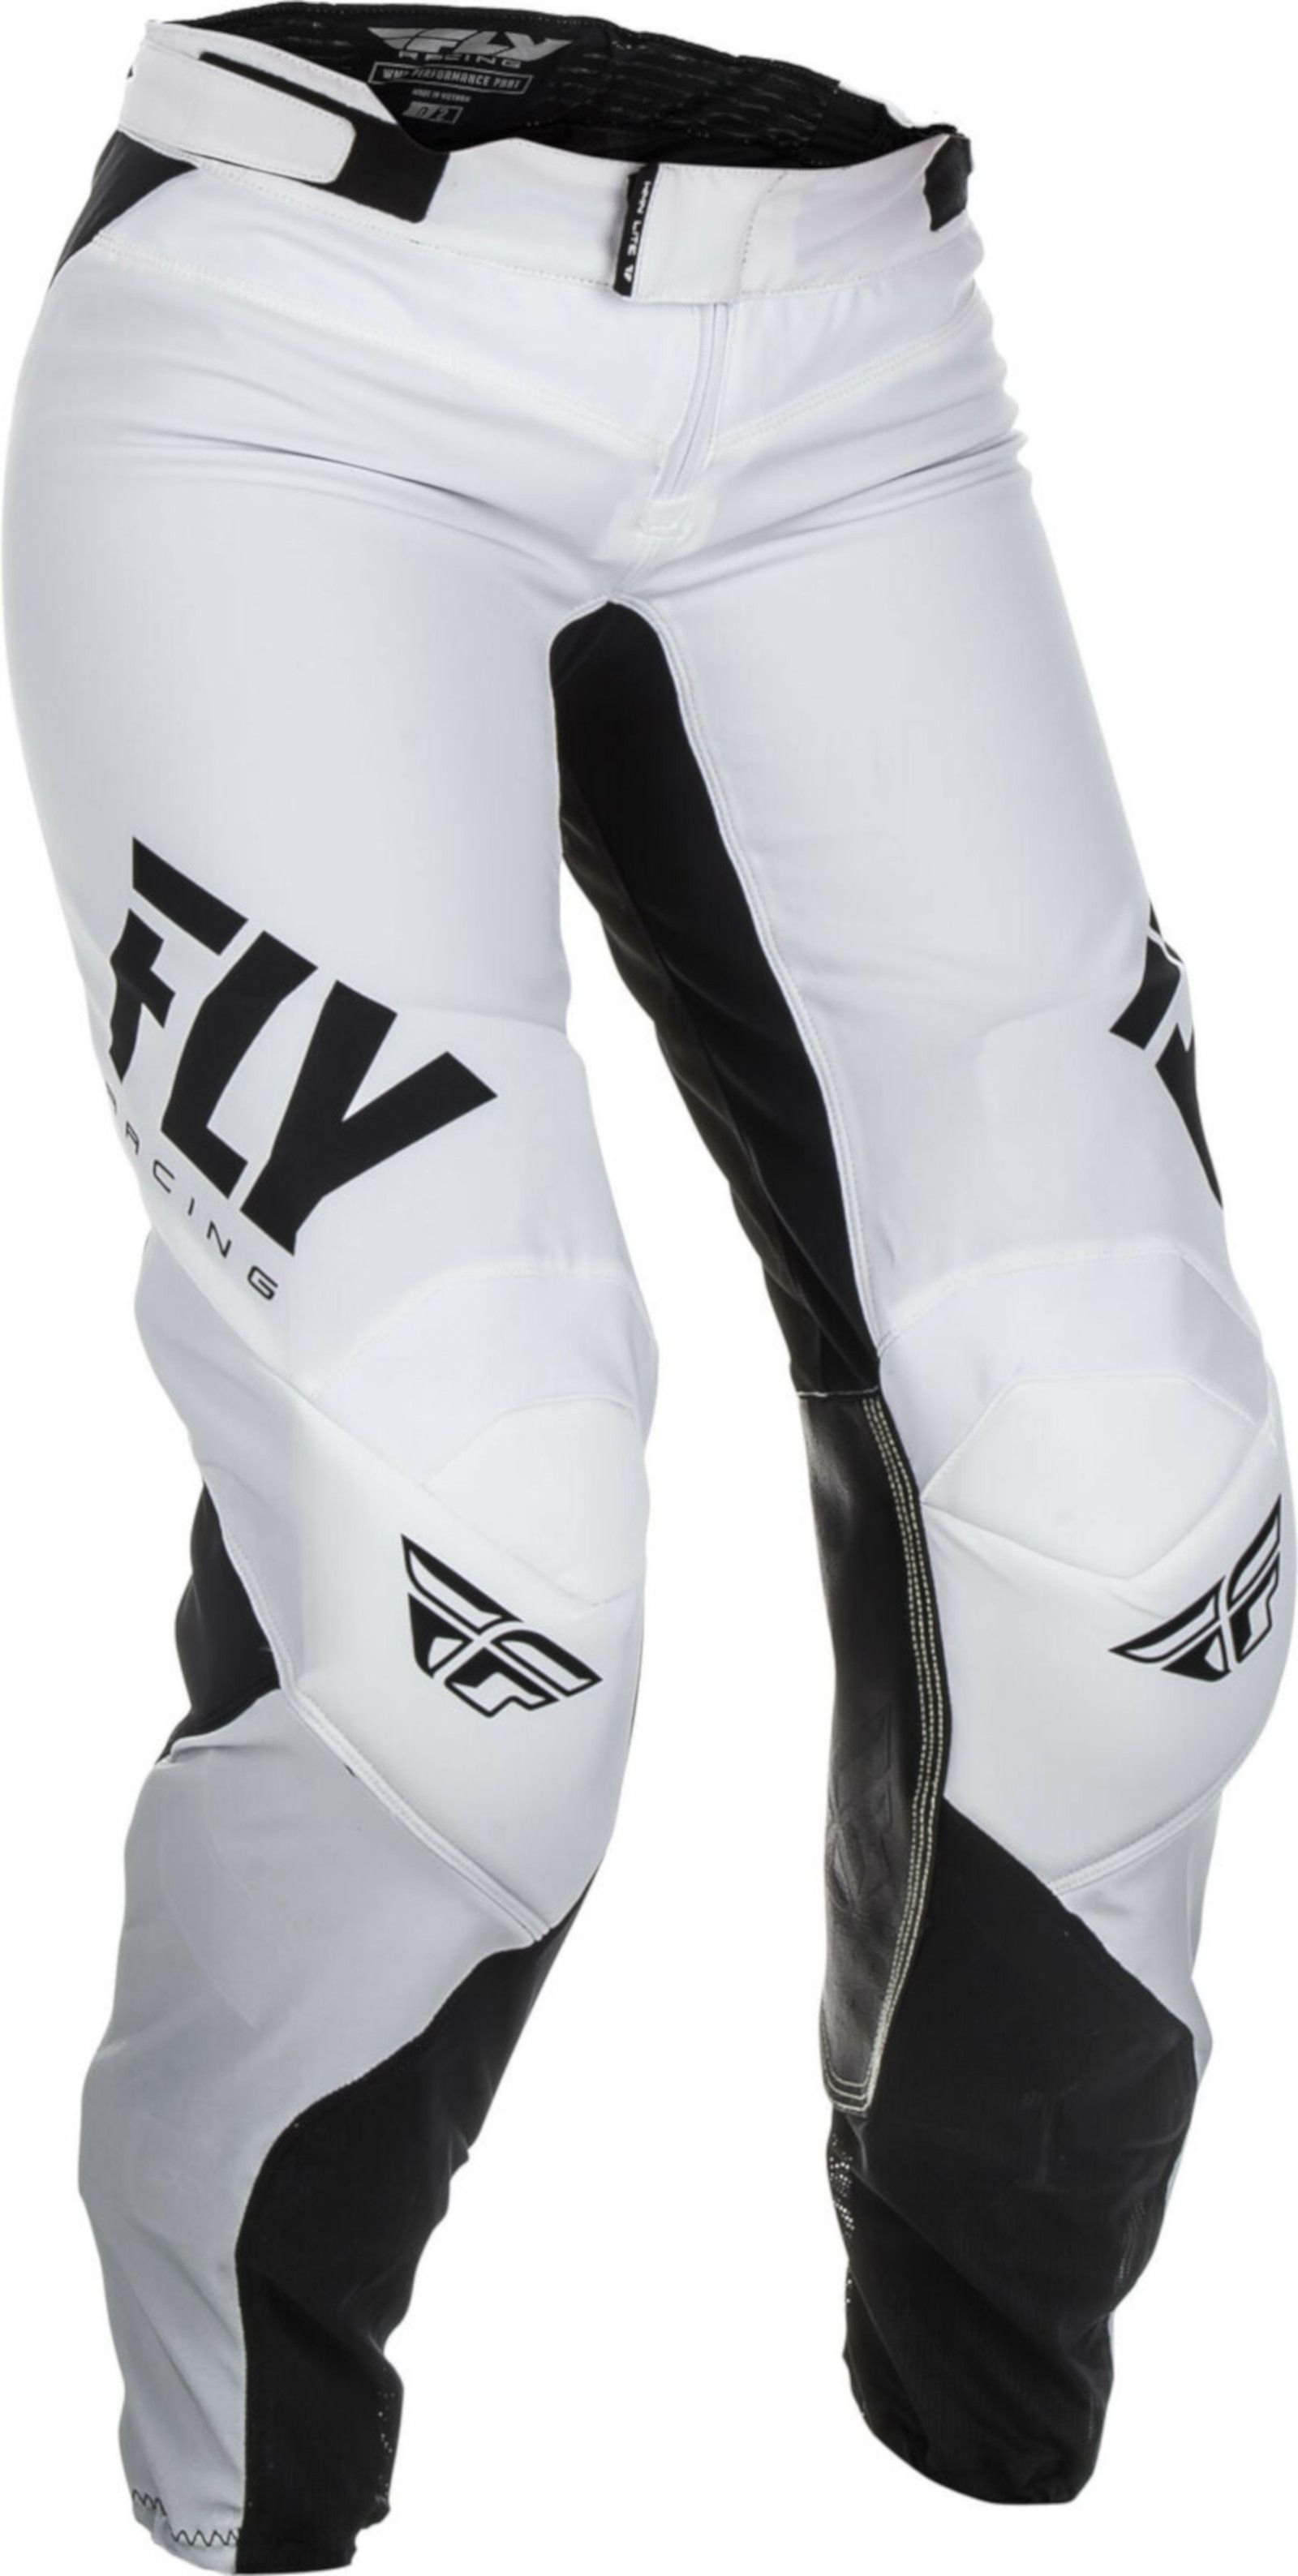 Fly Racing Ligero Mujer Motocross Caminos Mx Pantalones Blanco Negro Ebay